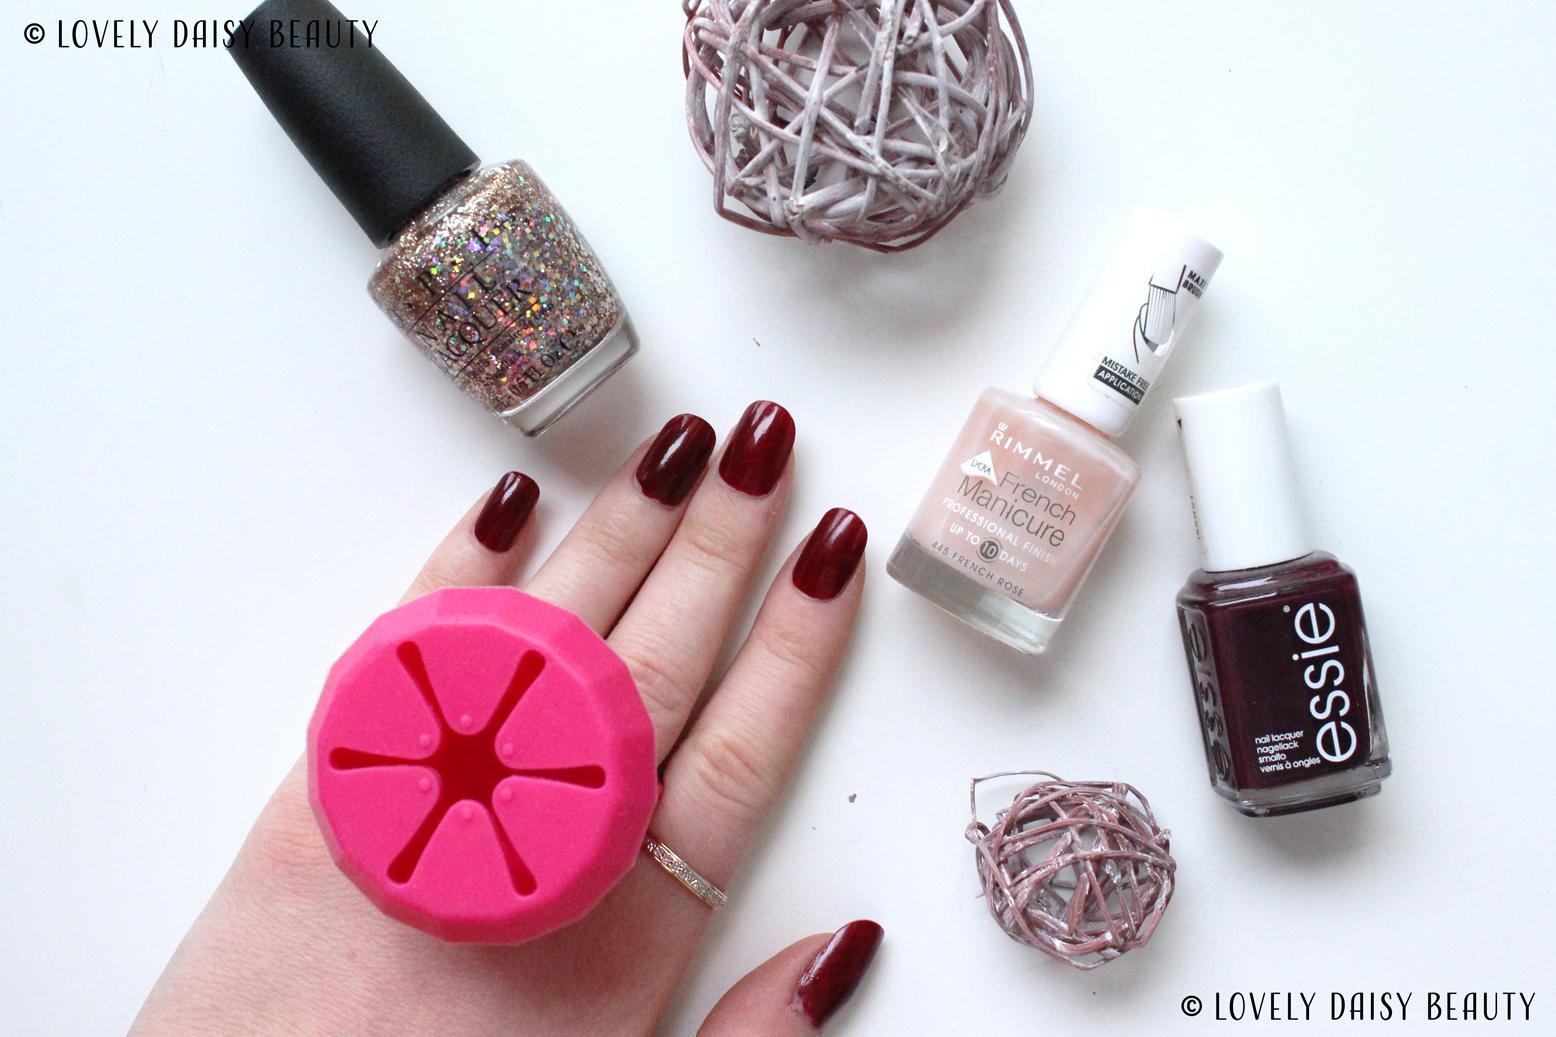 nail-polish-holder-primark5